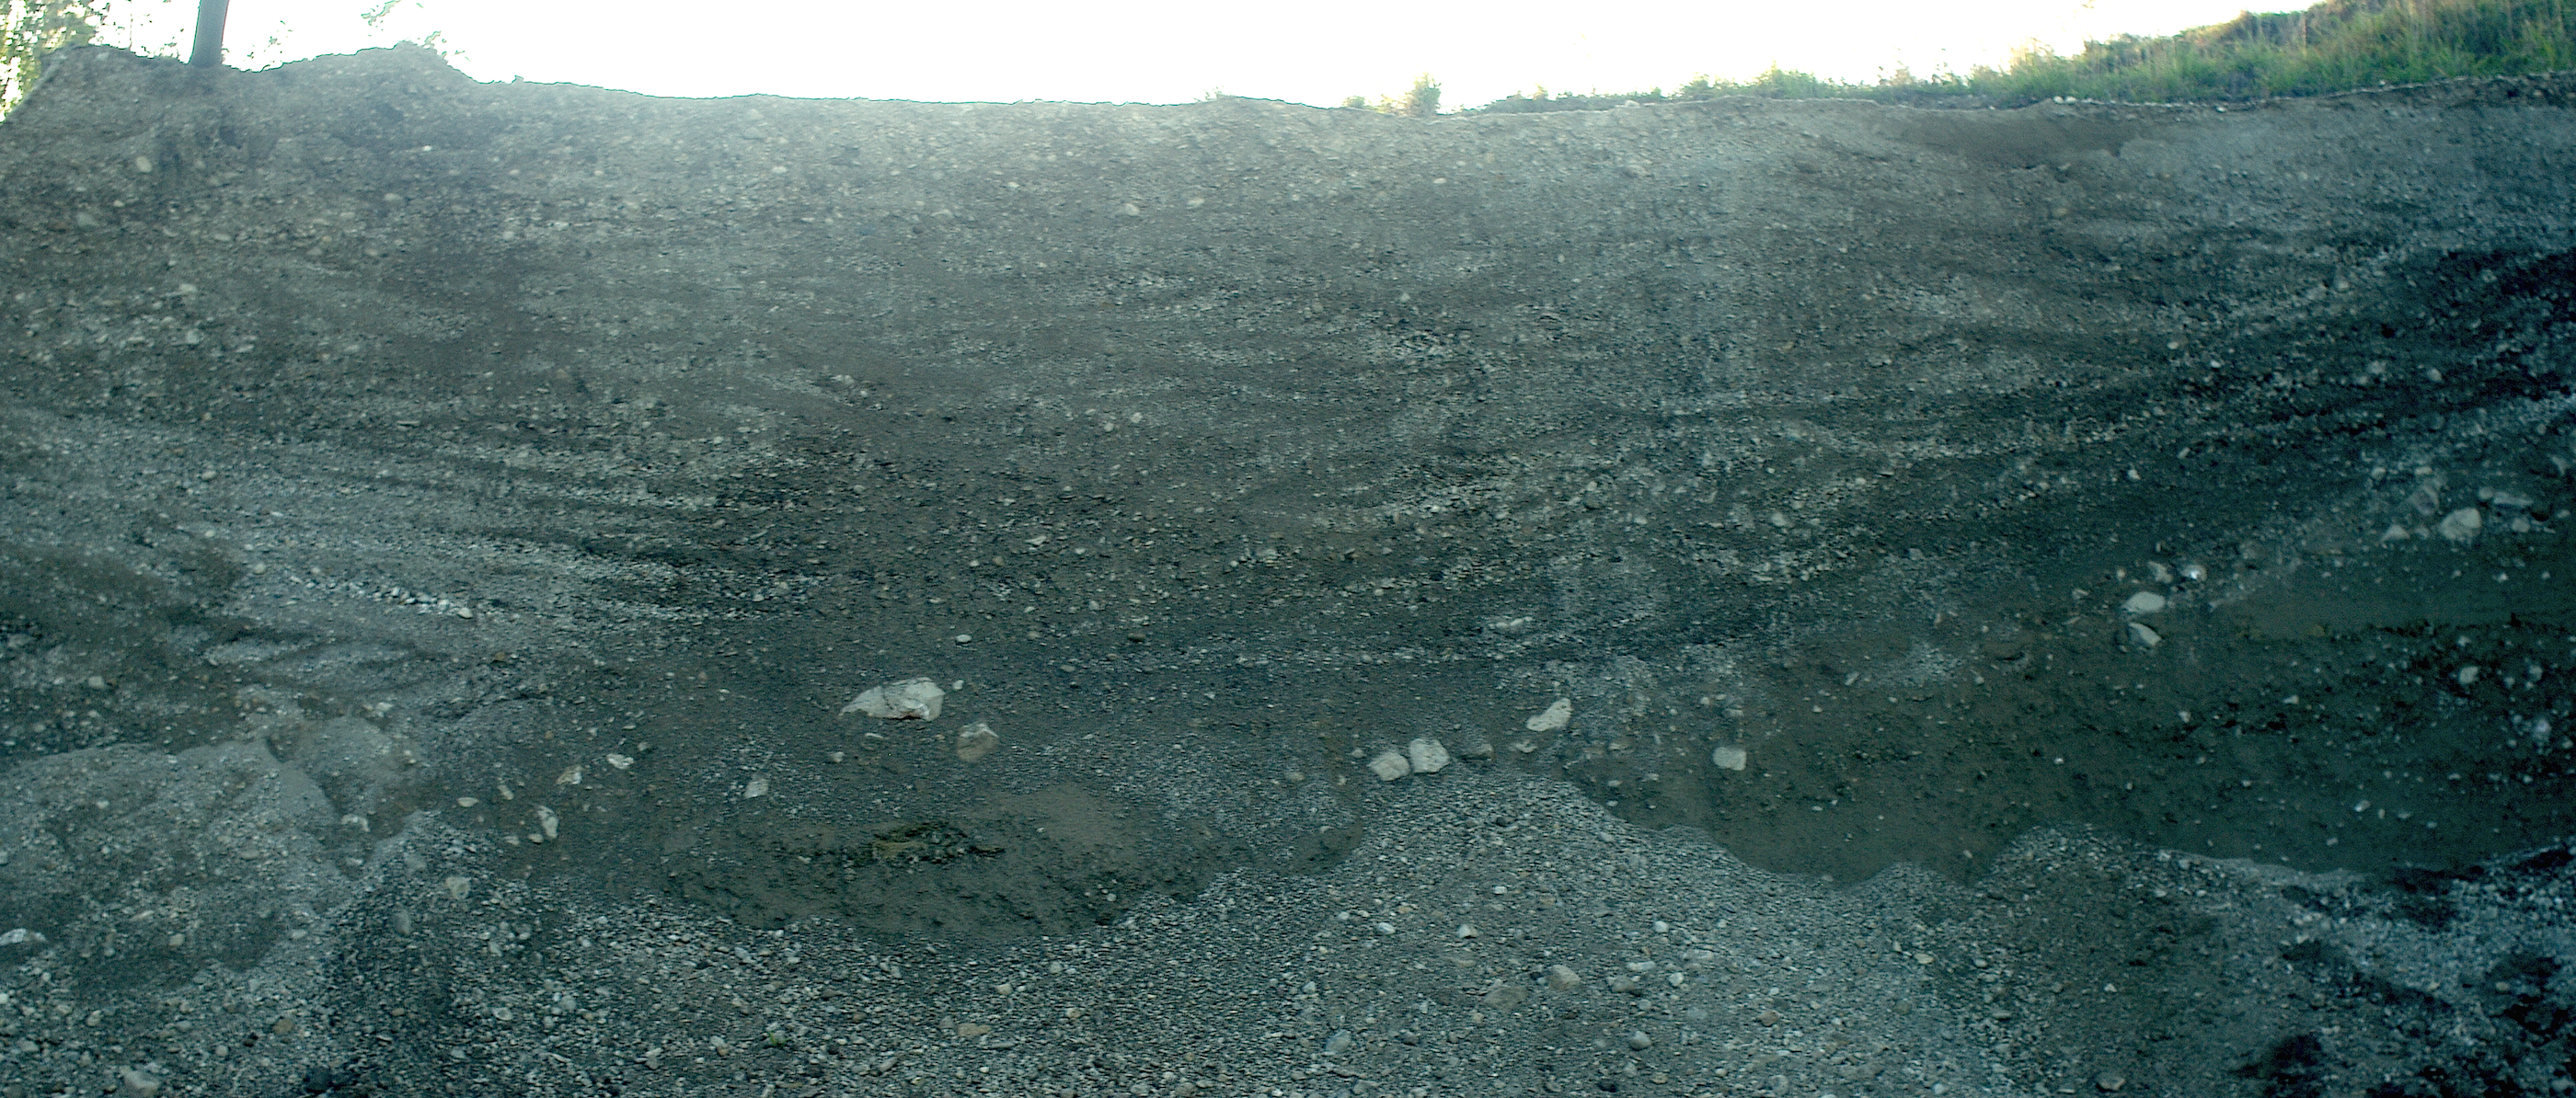 Diamiktit Kreuzschichtung Kiesgrube Eglsee Chiemgau-Impakt